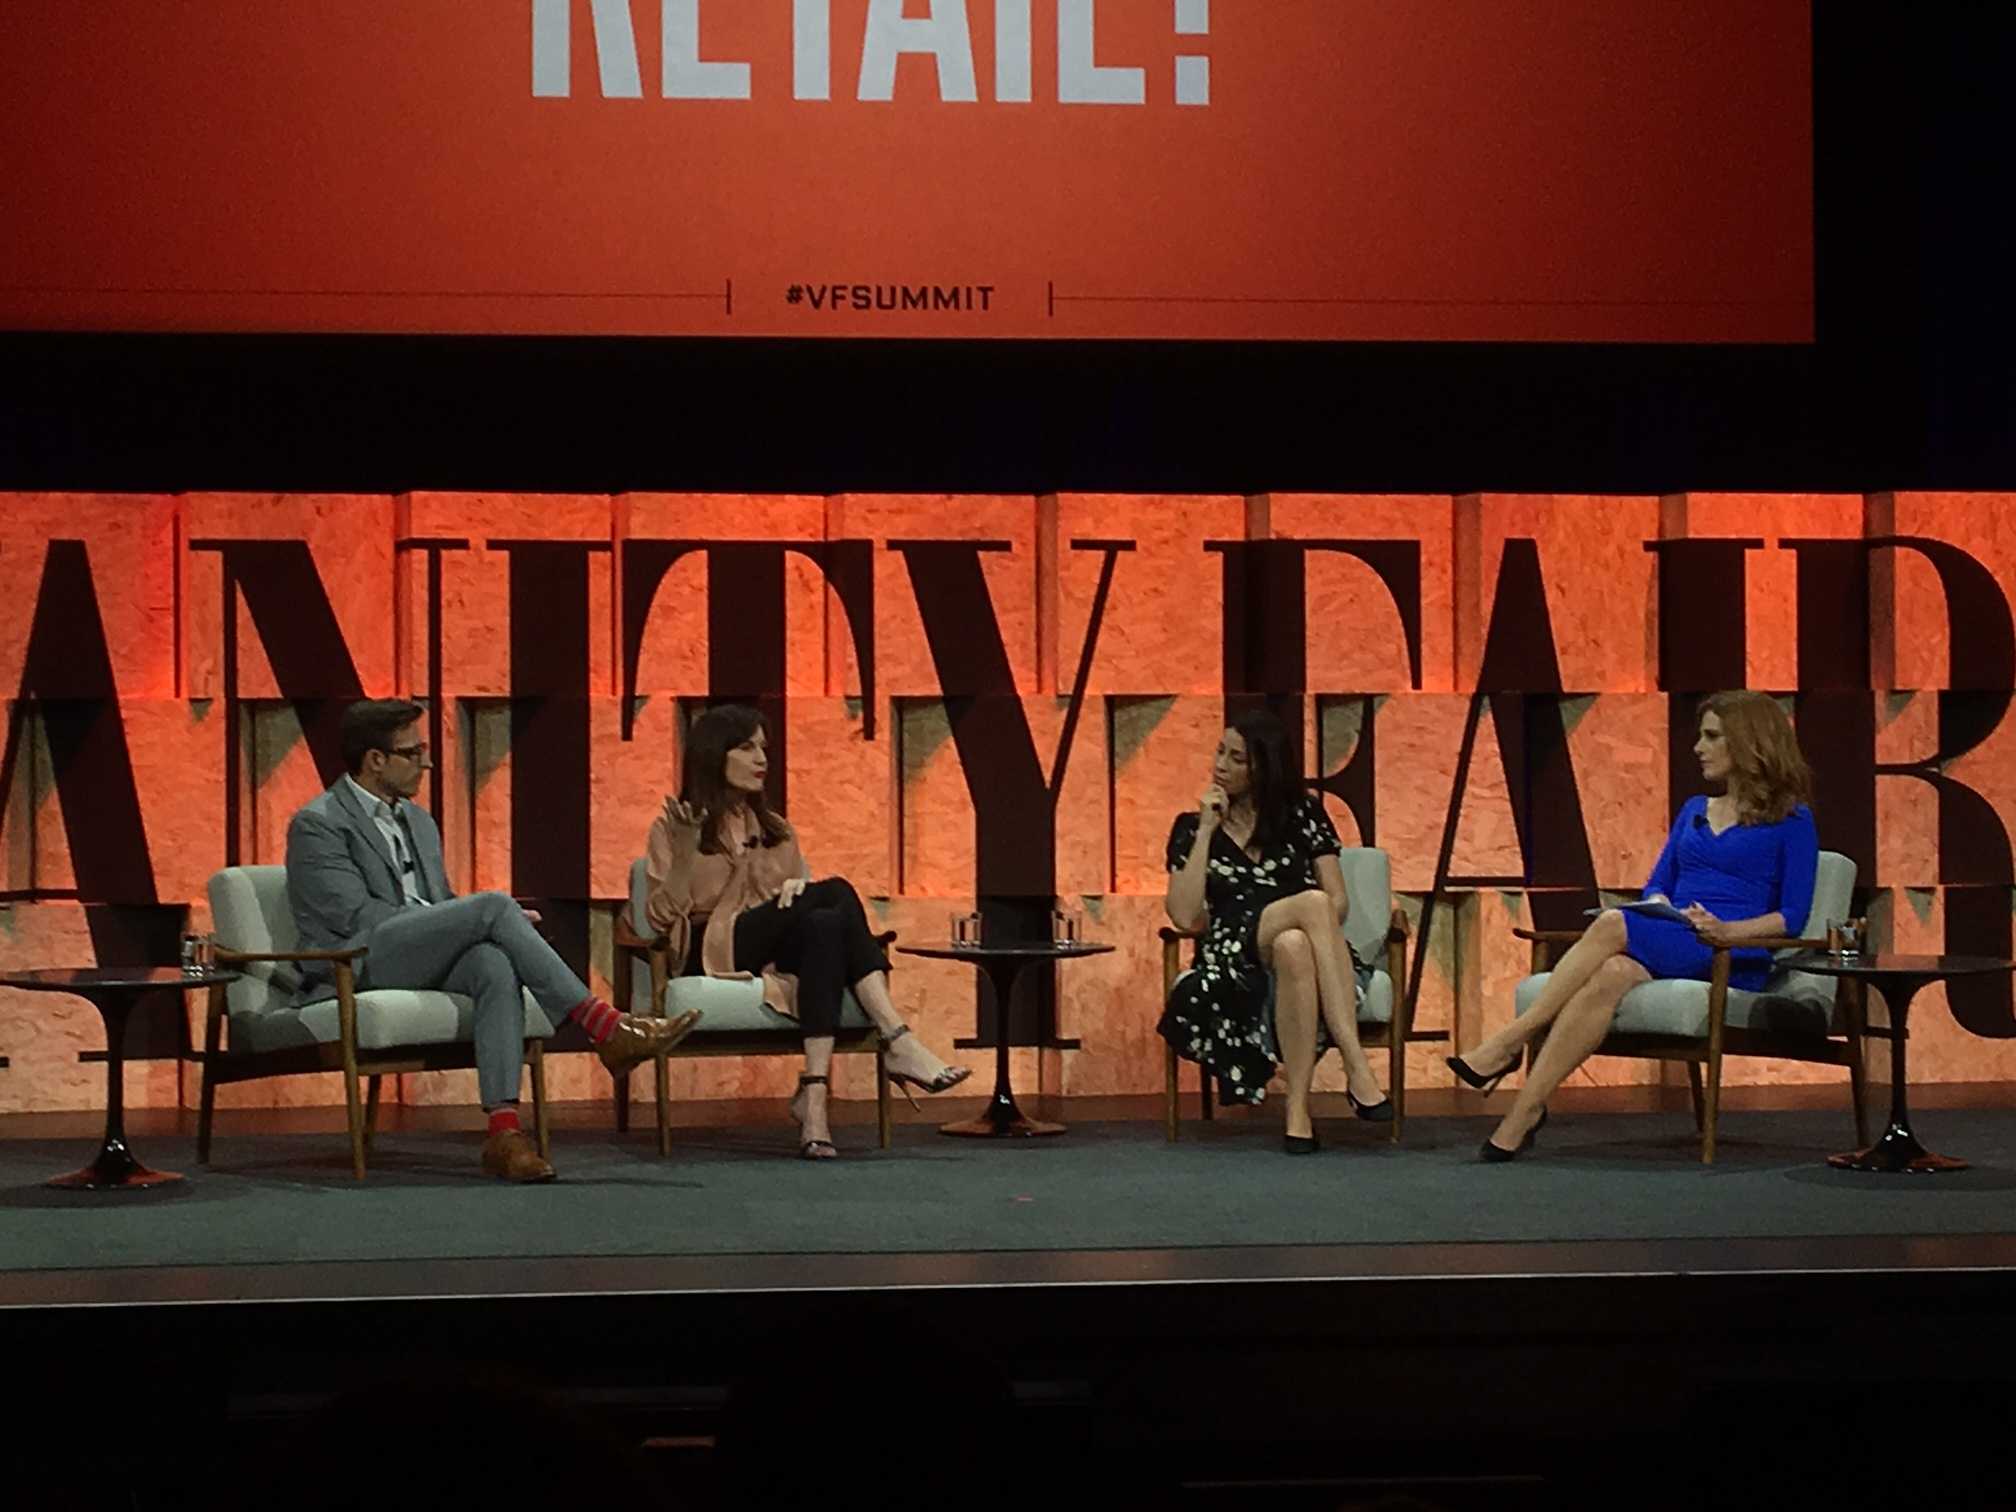 Calvin McDonald of Sephora, Daniella Vitale of Barneys New York, Yael Aflalo of Reformation, and Julia Boorstin of CNBC at the 2017 Vanity Fair New Establishment Summit in Beverly Hills, Calif.